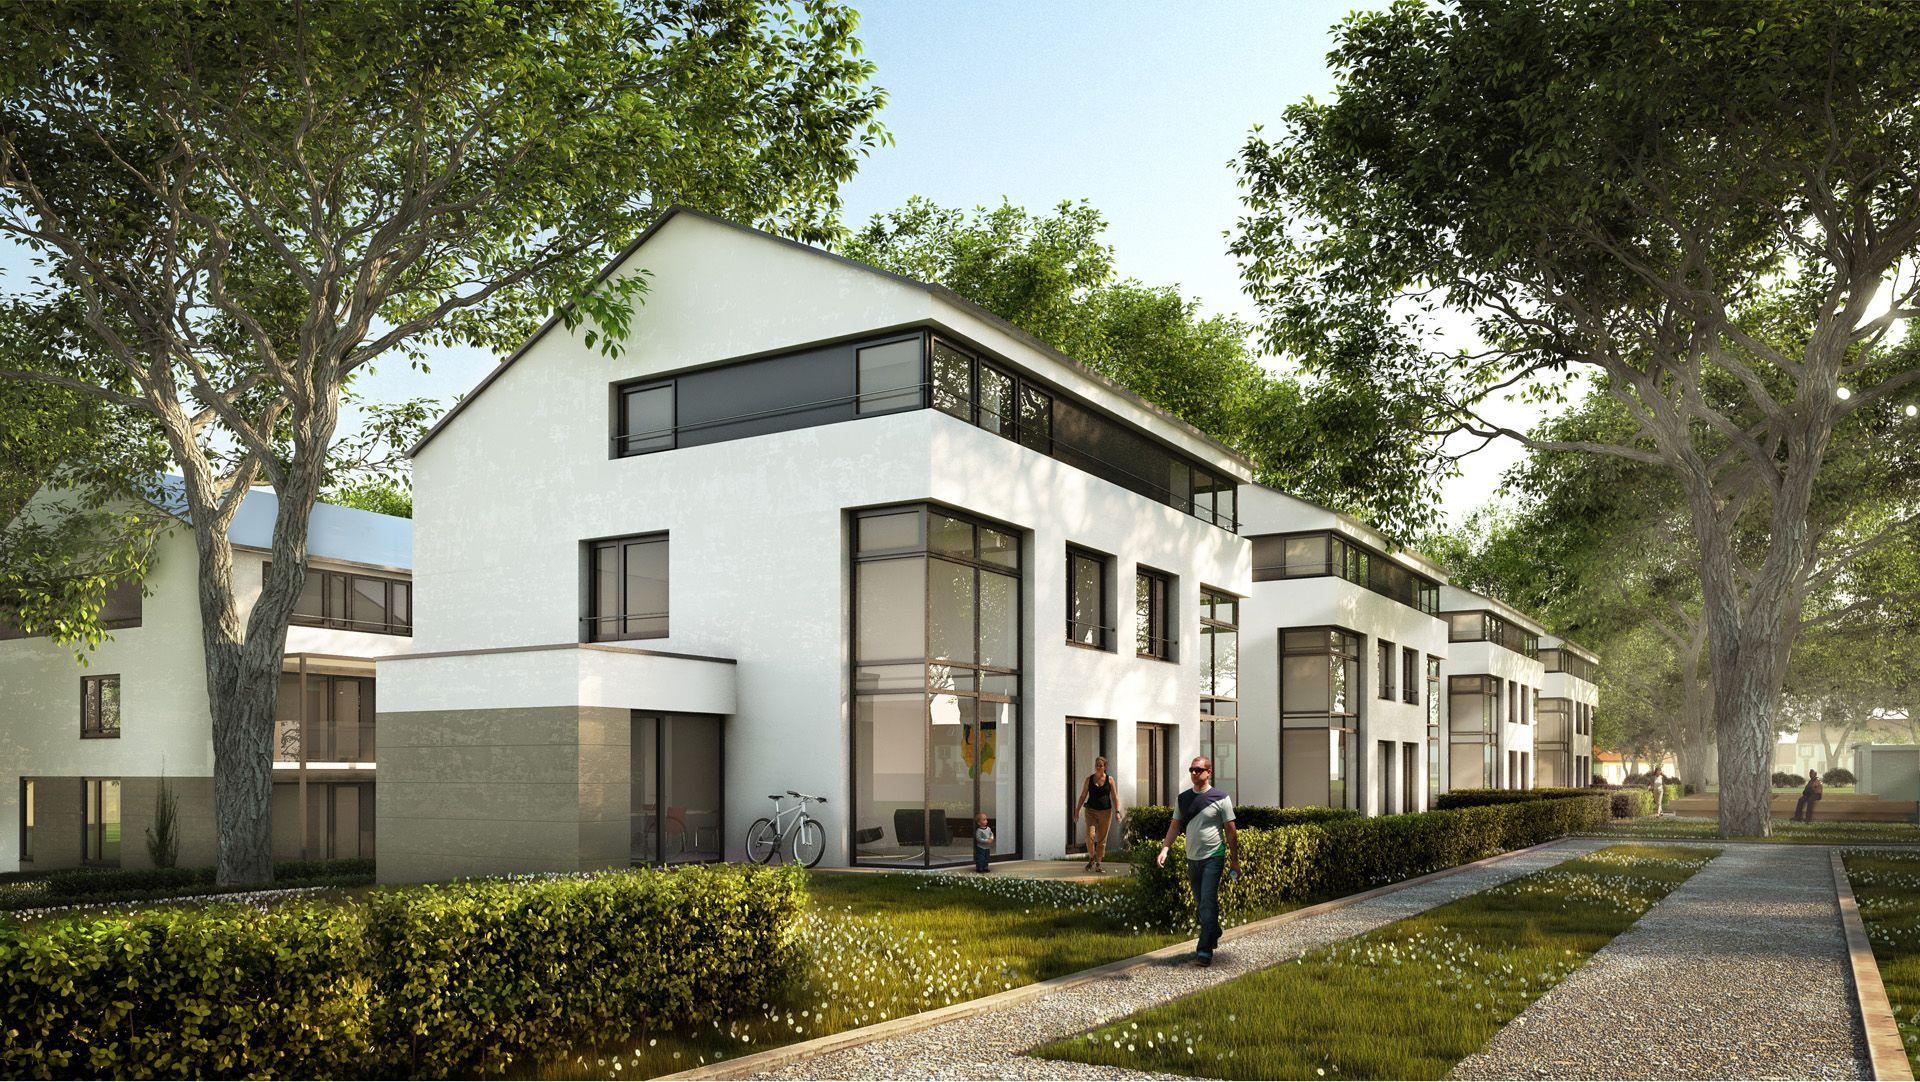 1000+ images about Hausbau/Umbau/enovierung on Pinterest Haus ... size: 1920 x 1082 post ID: 2 File size: 0 B